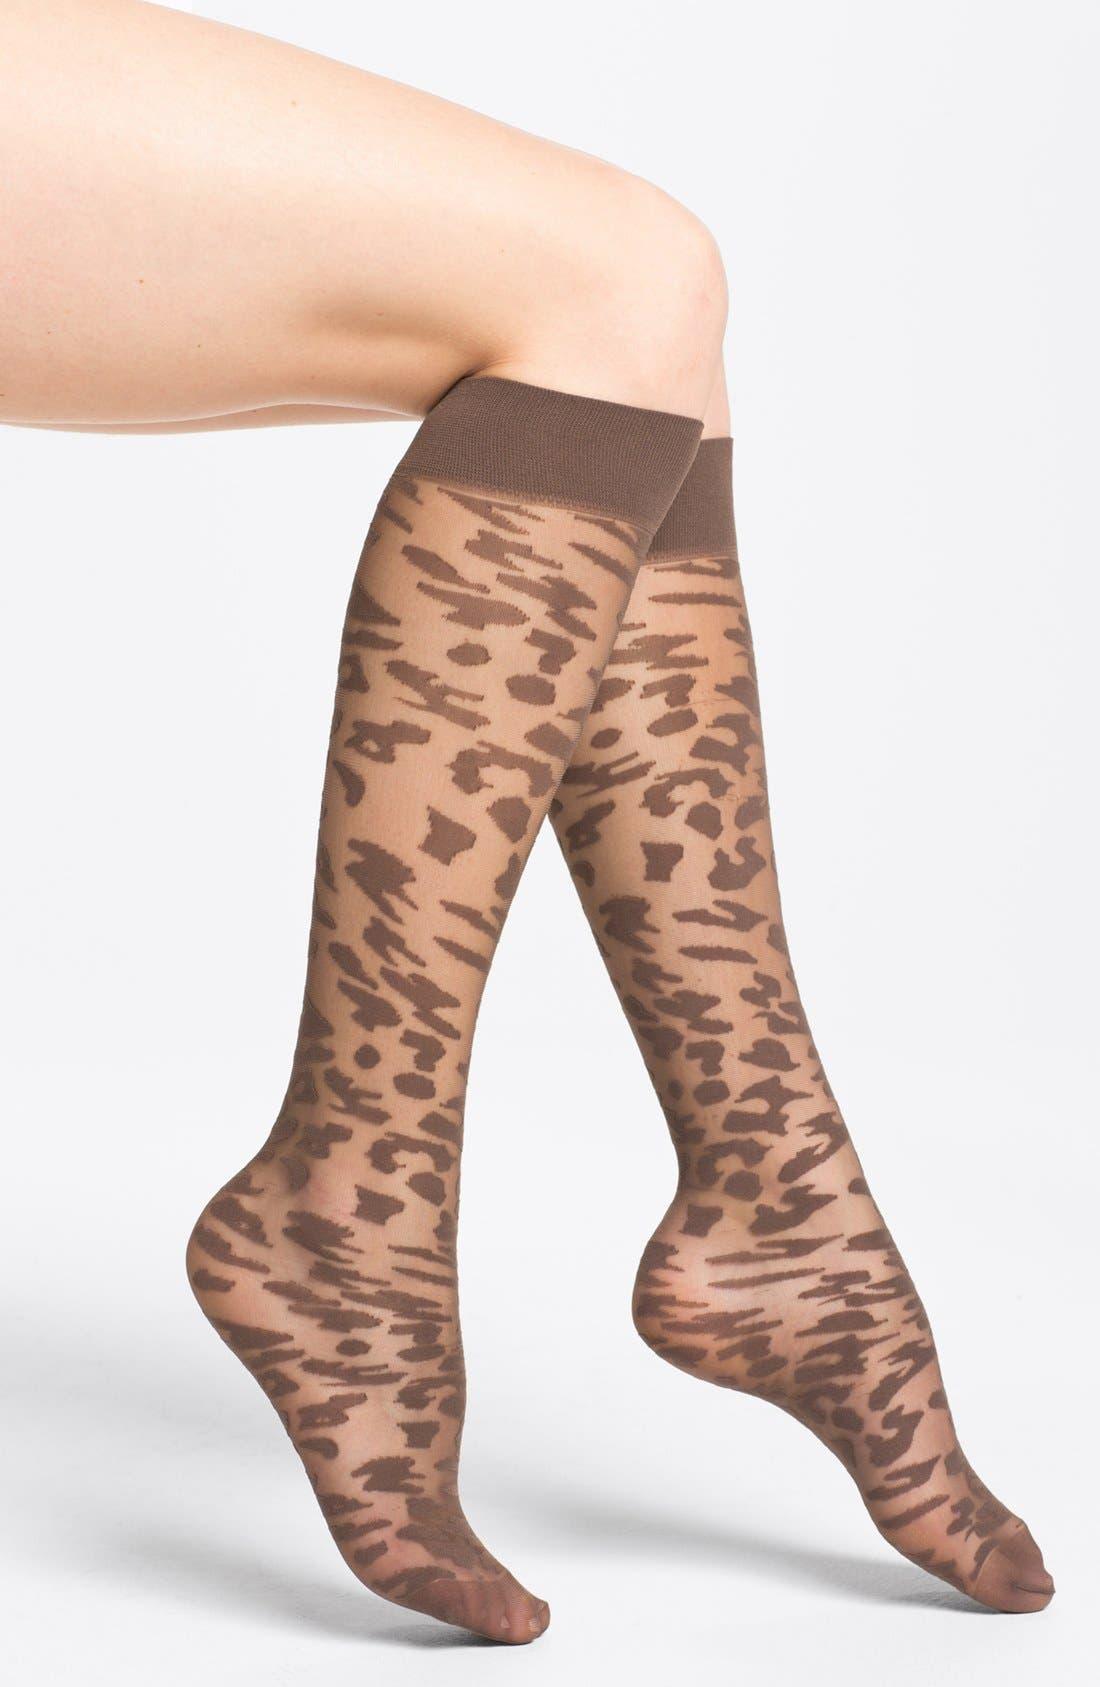 Main Image - Nordstrom 'Animal Instincts' Trouser Socks